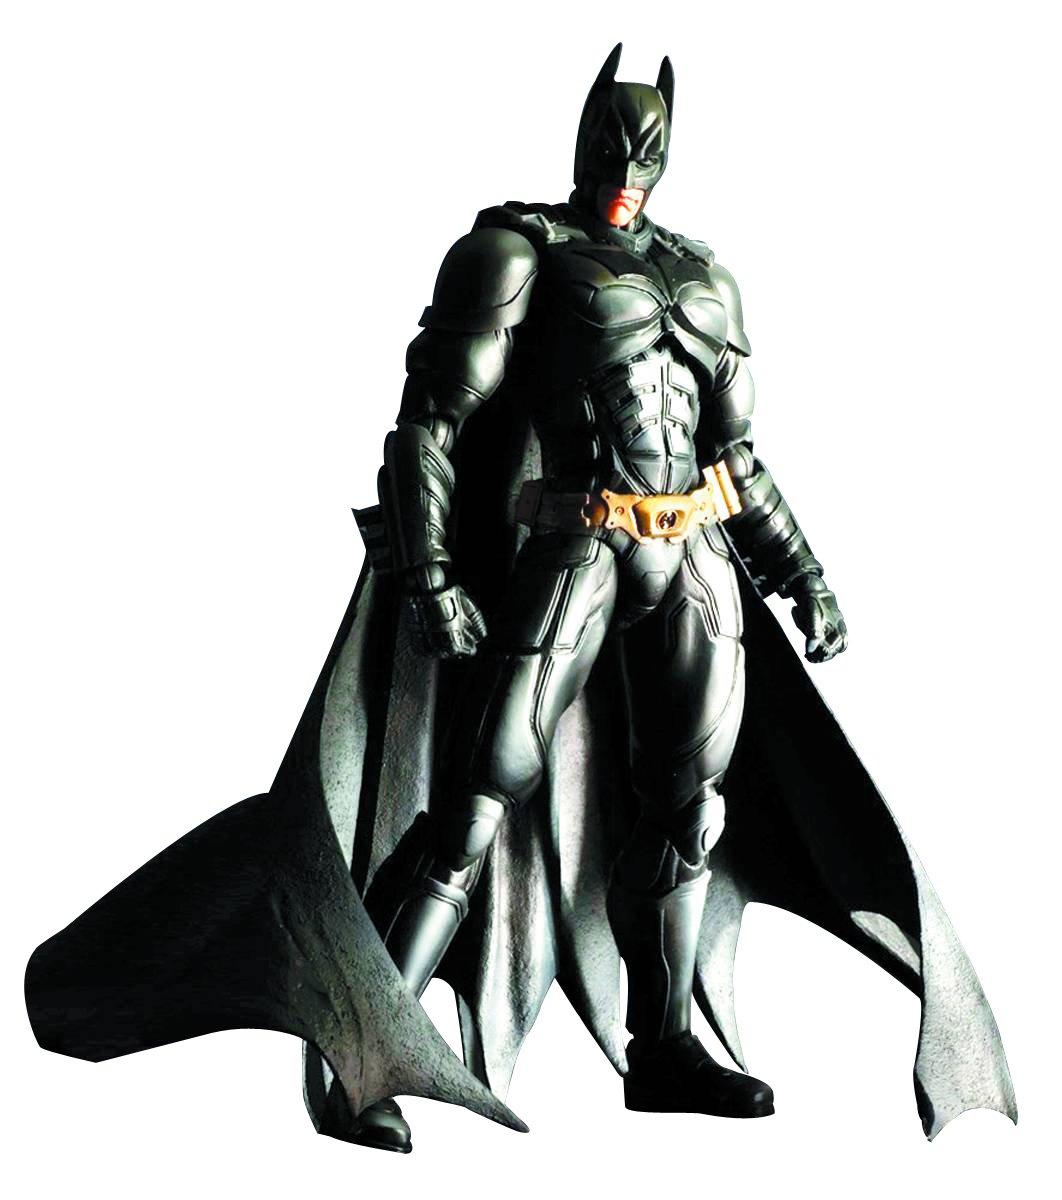 Batman - The Dark Knight Rises Play Arts Kai Actionfigur: Batman